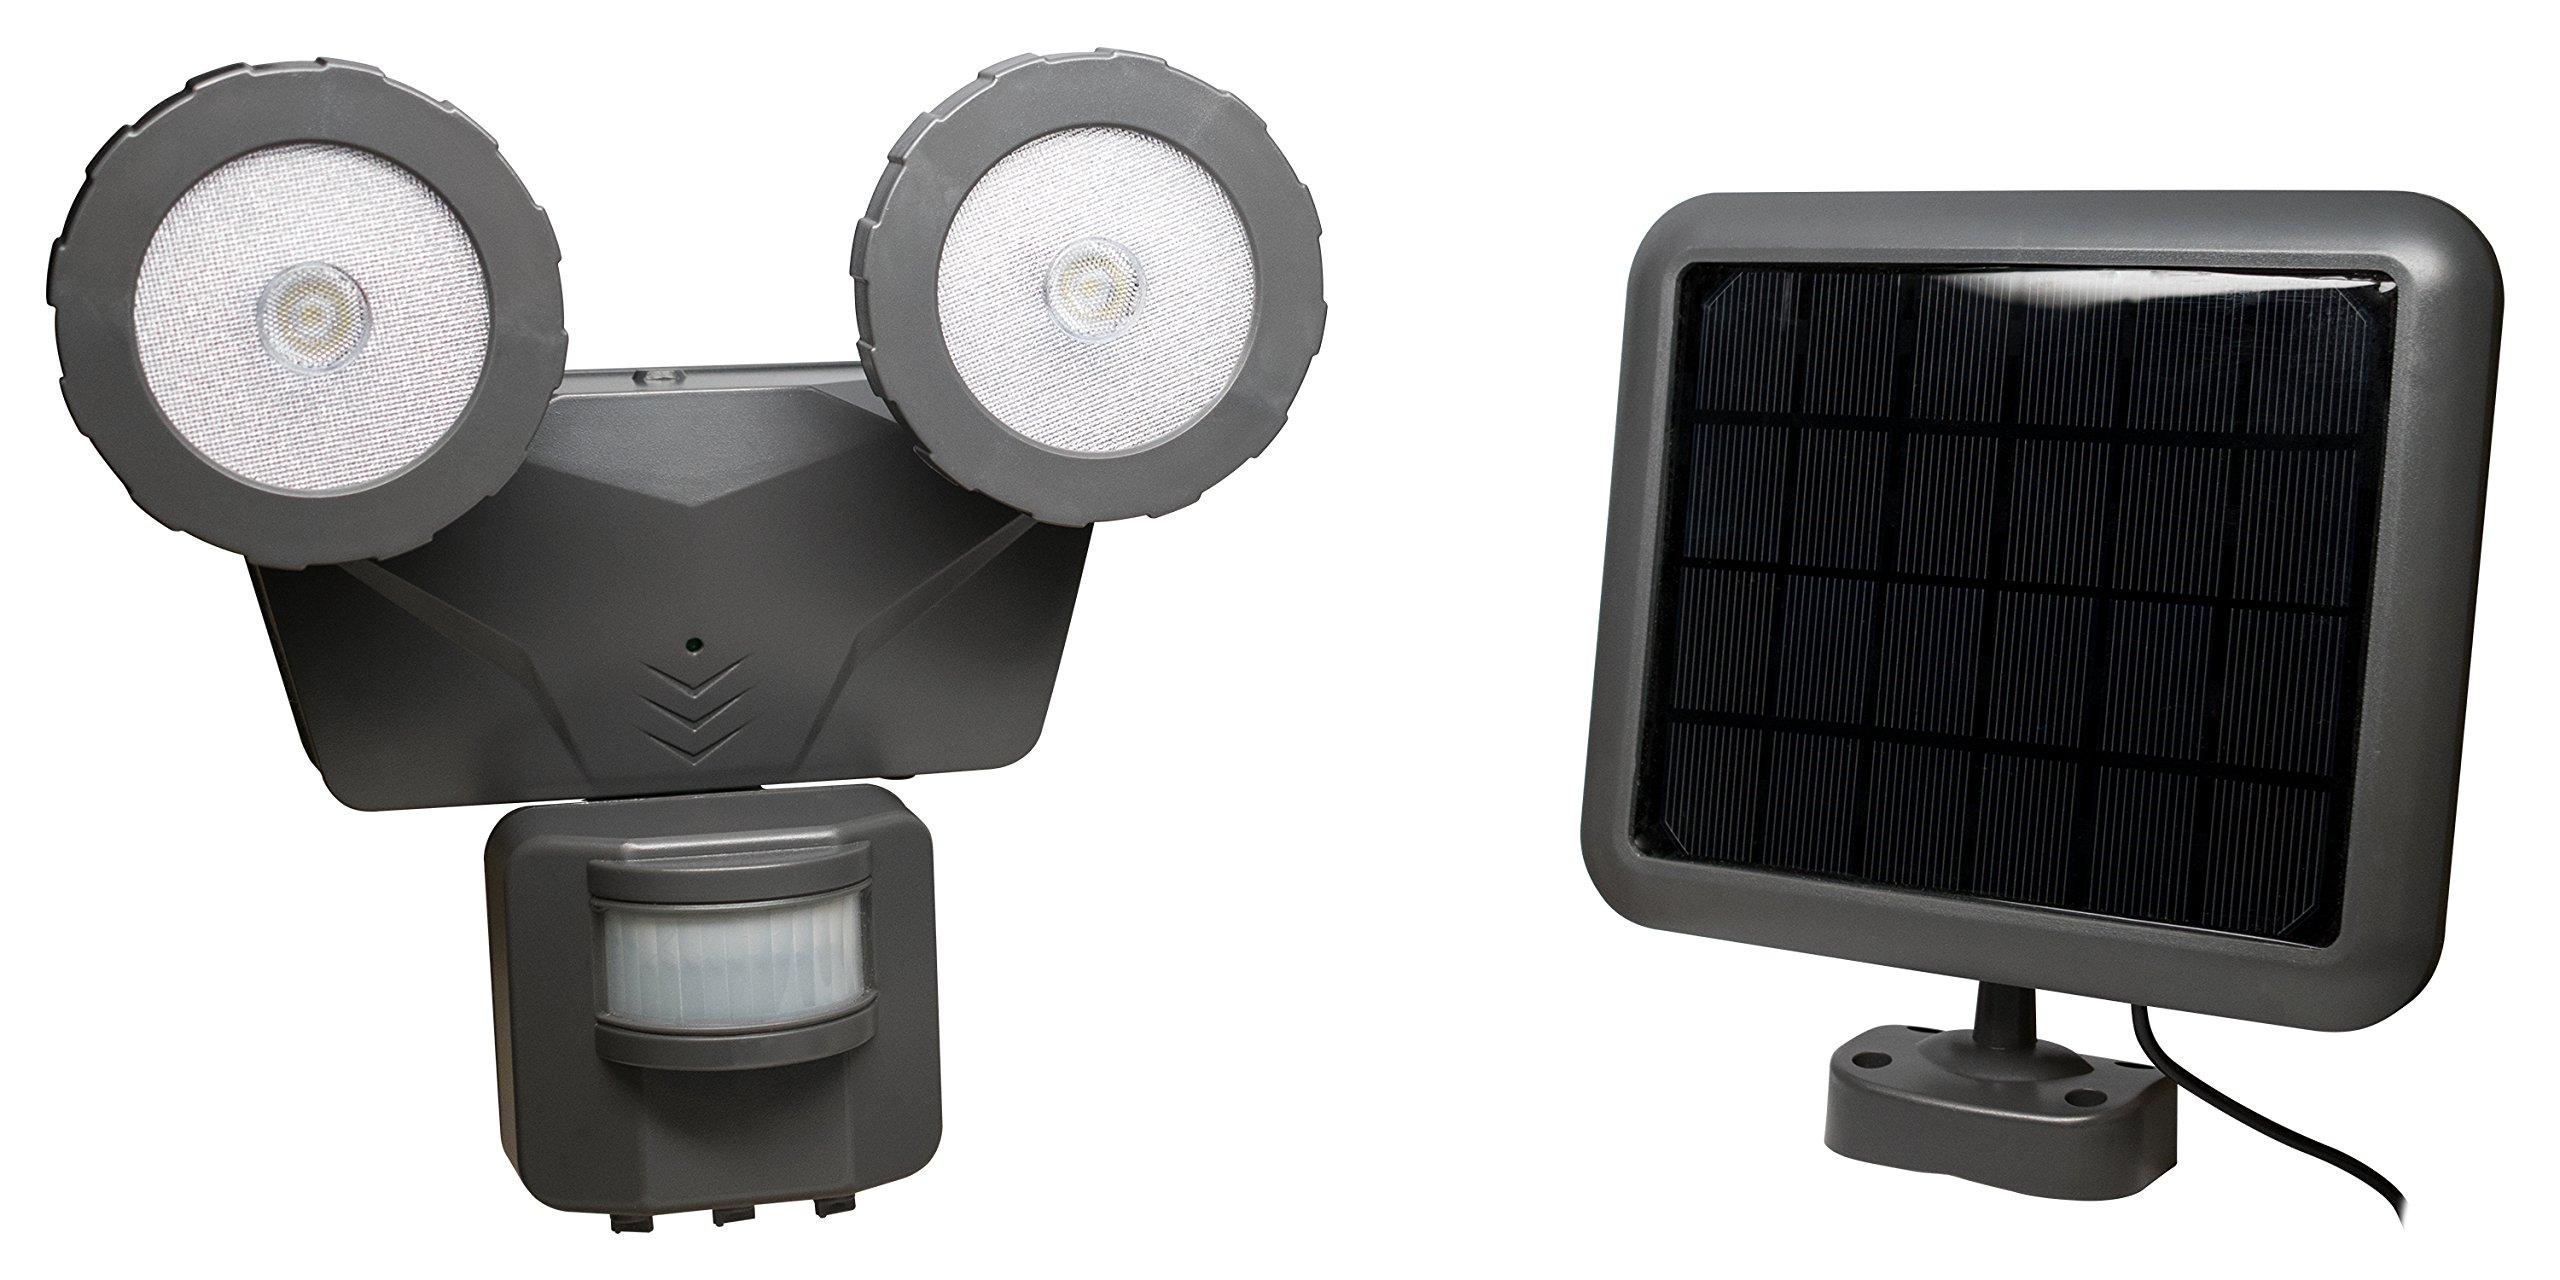 Novolink NL-DSG2 160° Outdoor 500 lm Solar LED Motion Activated Light, Dark Grey